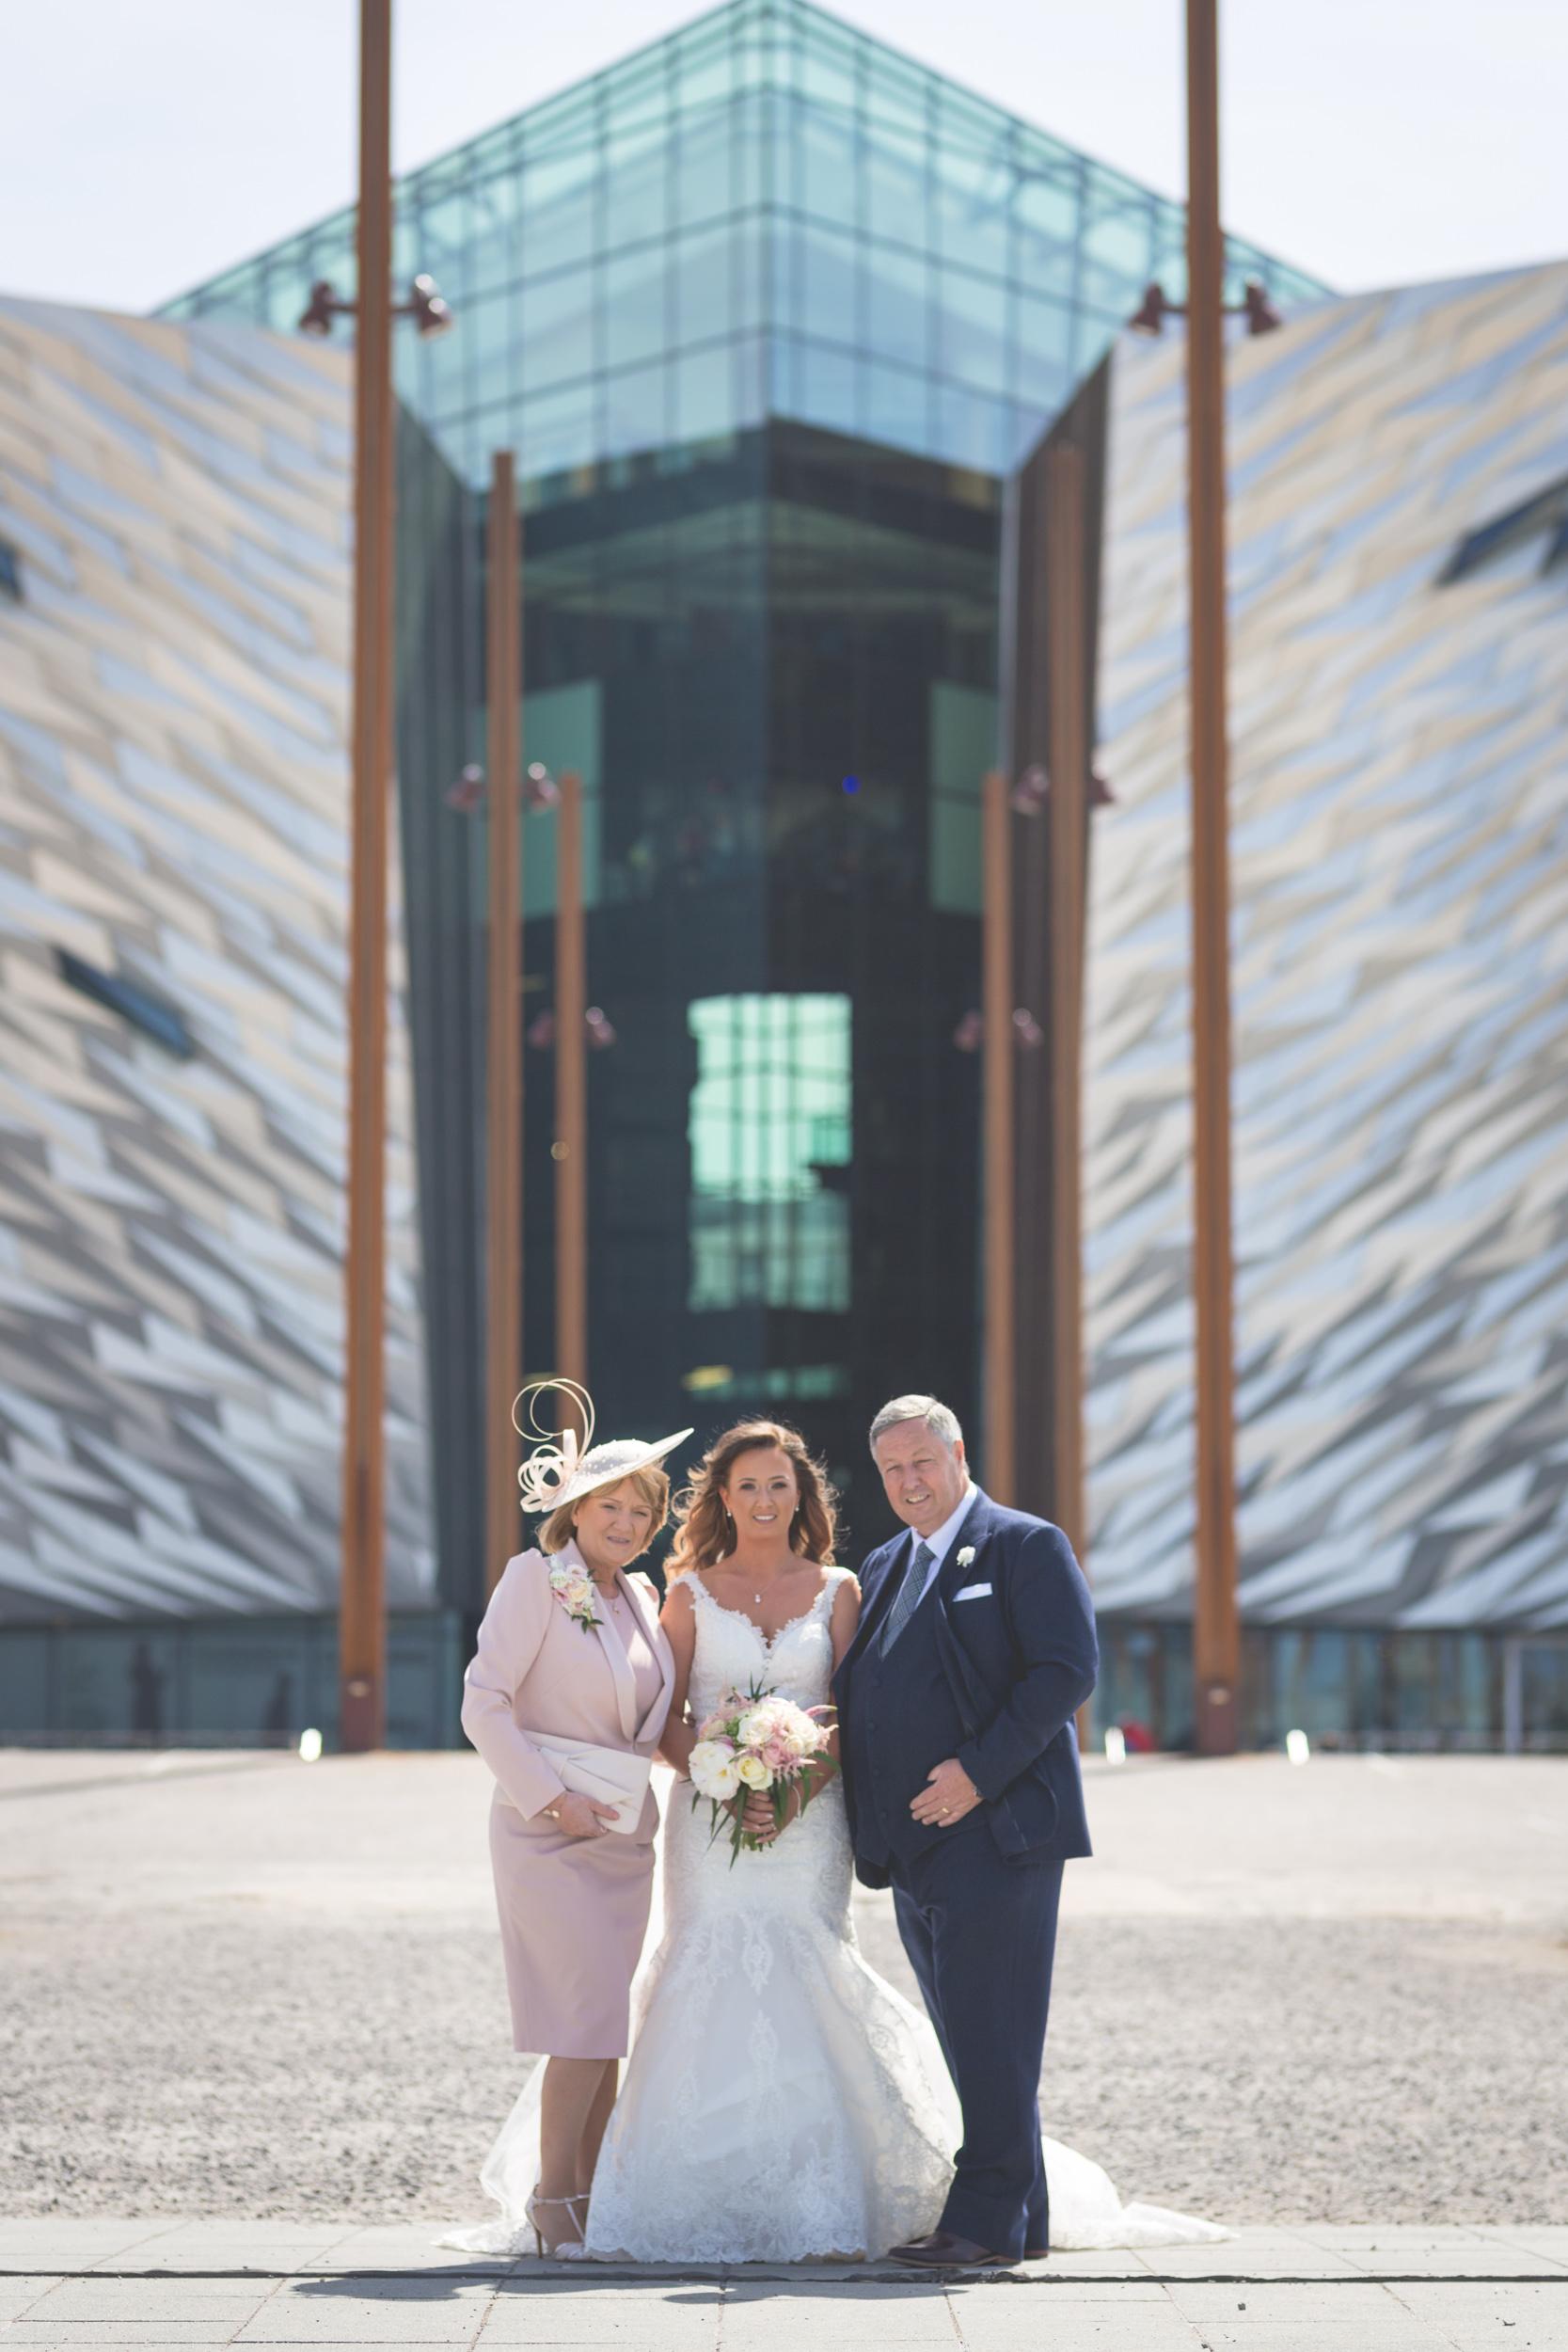 Brian McEwan   Northern Ireland Wedding Photographer   Rebecca & Michael   Portraits-37.jpg